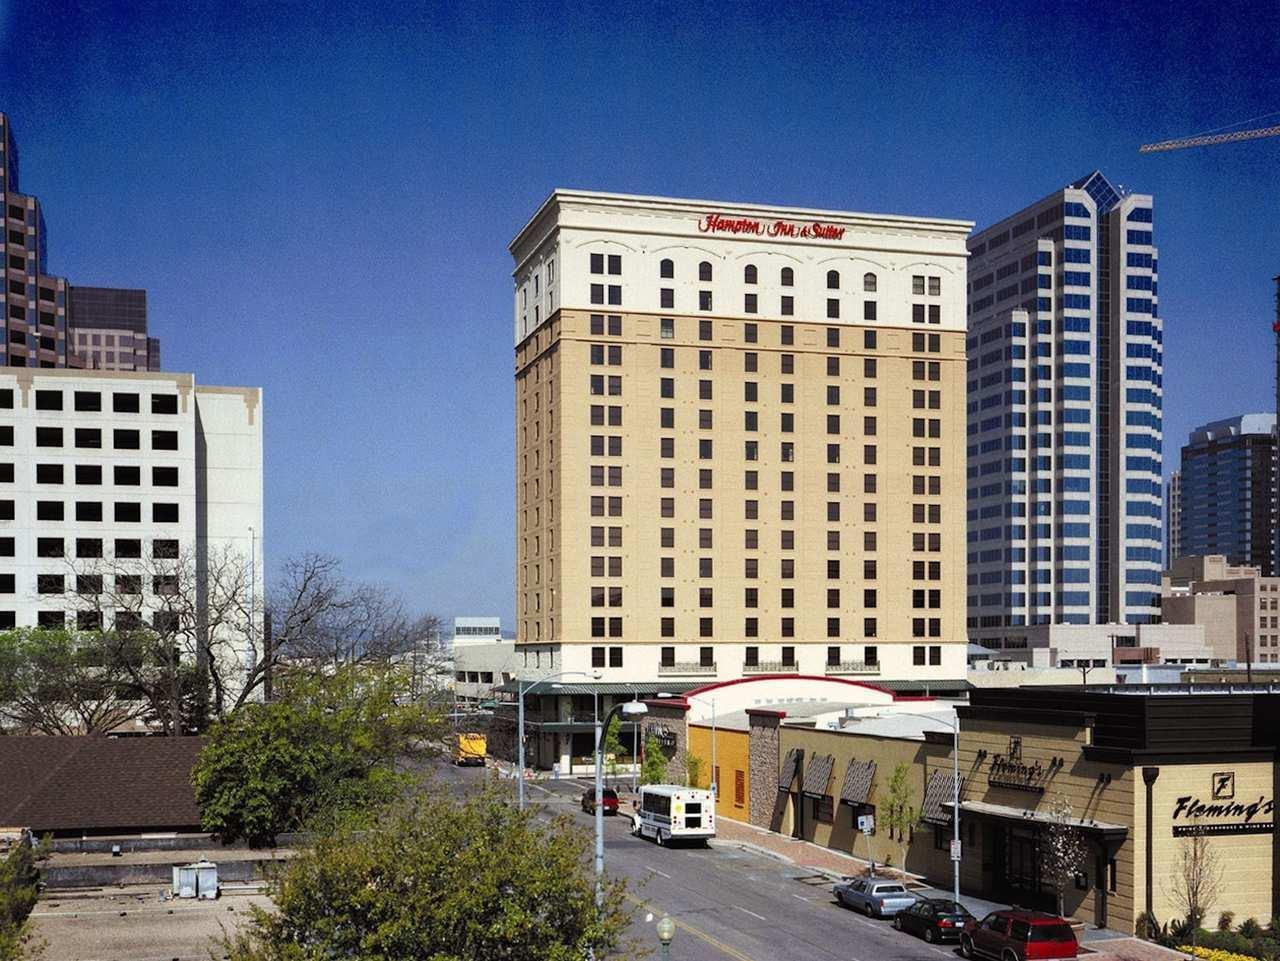 Hampton Inn And Suites Austin Downtown Hotel